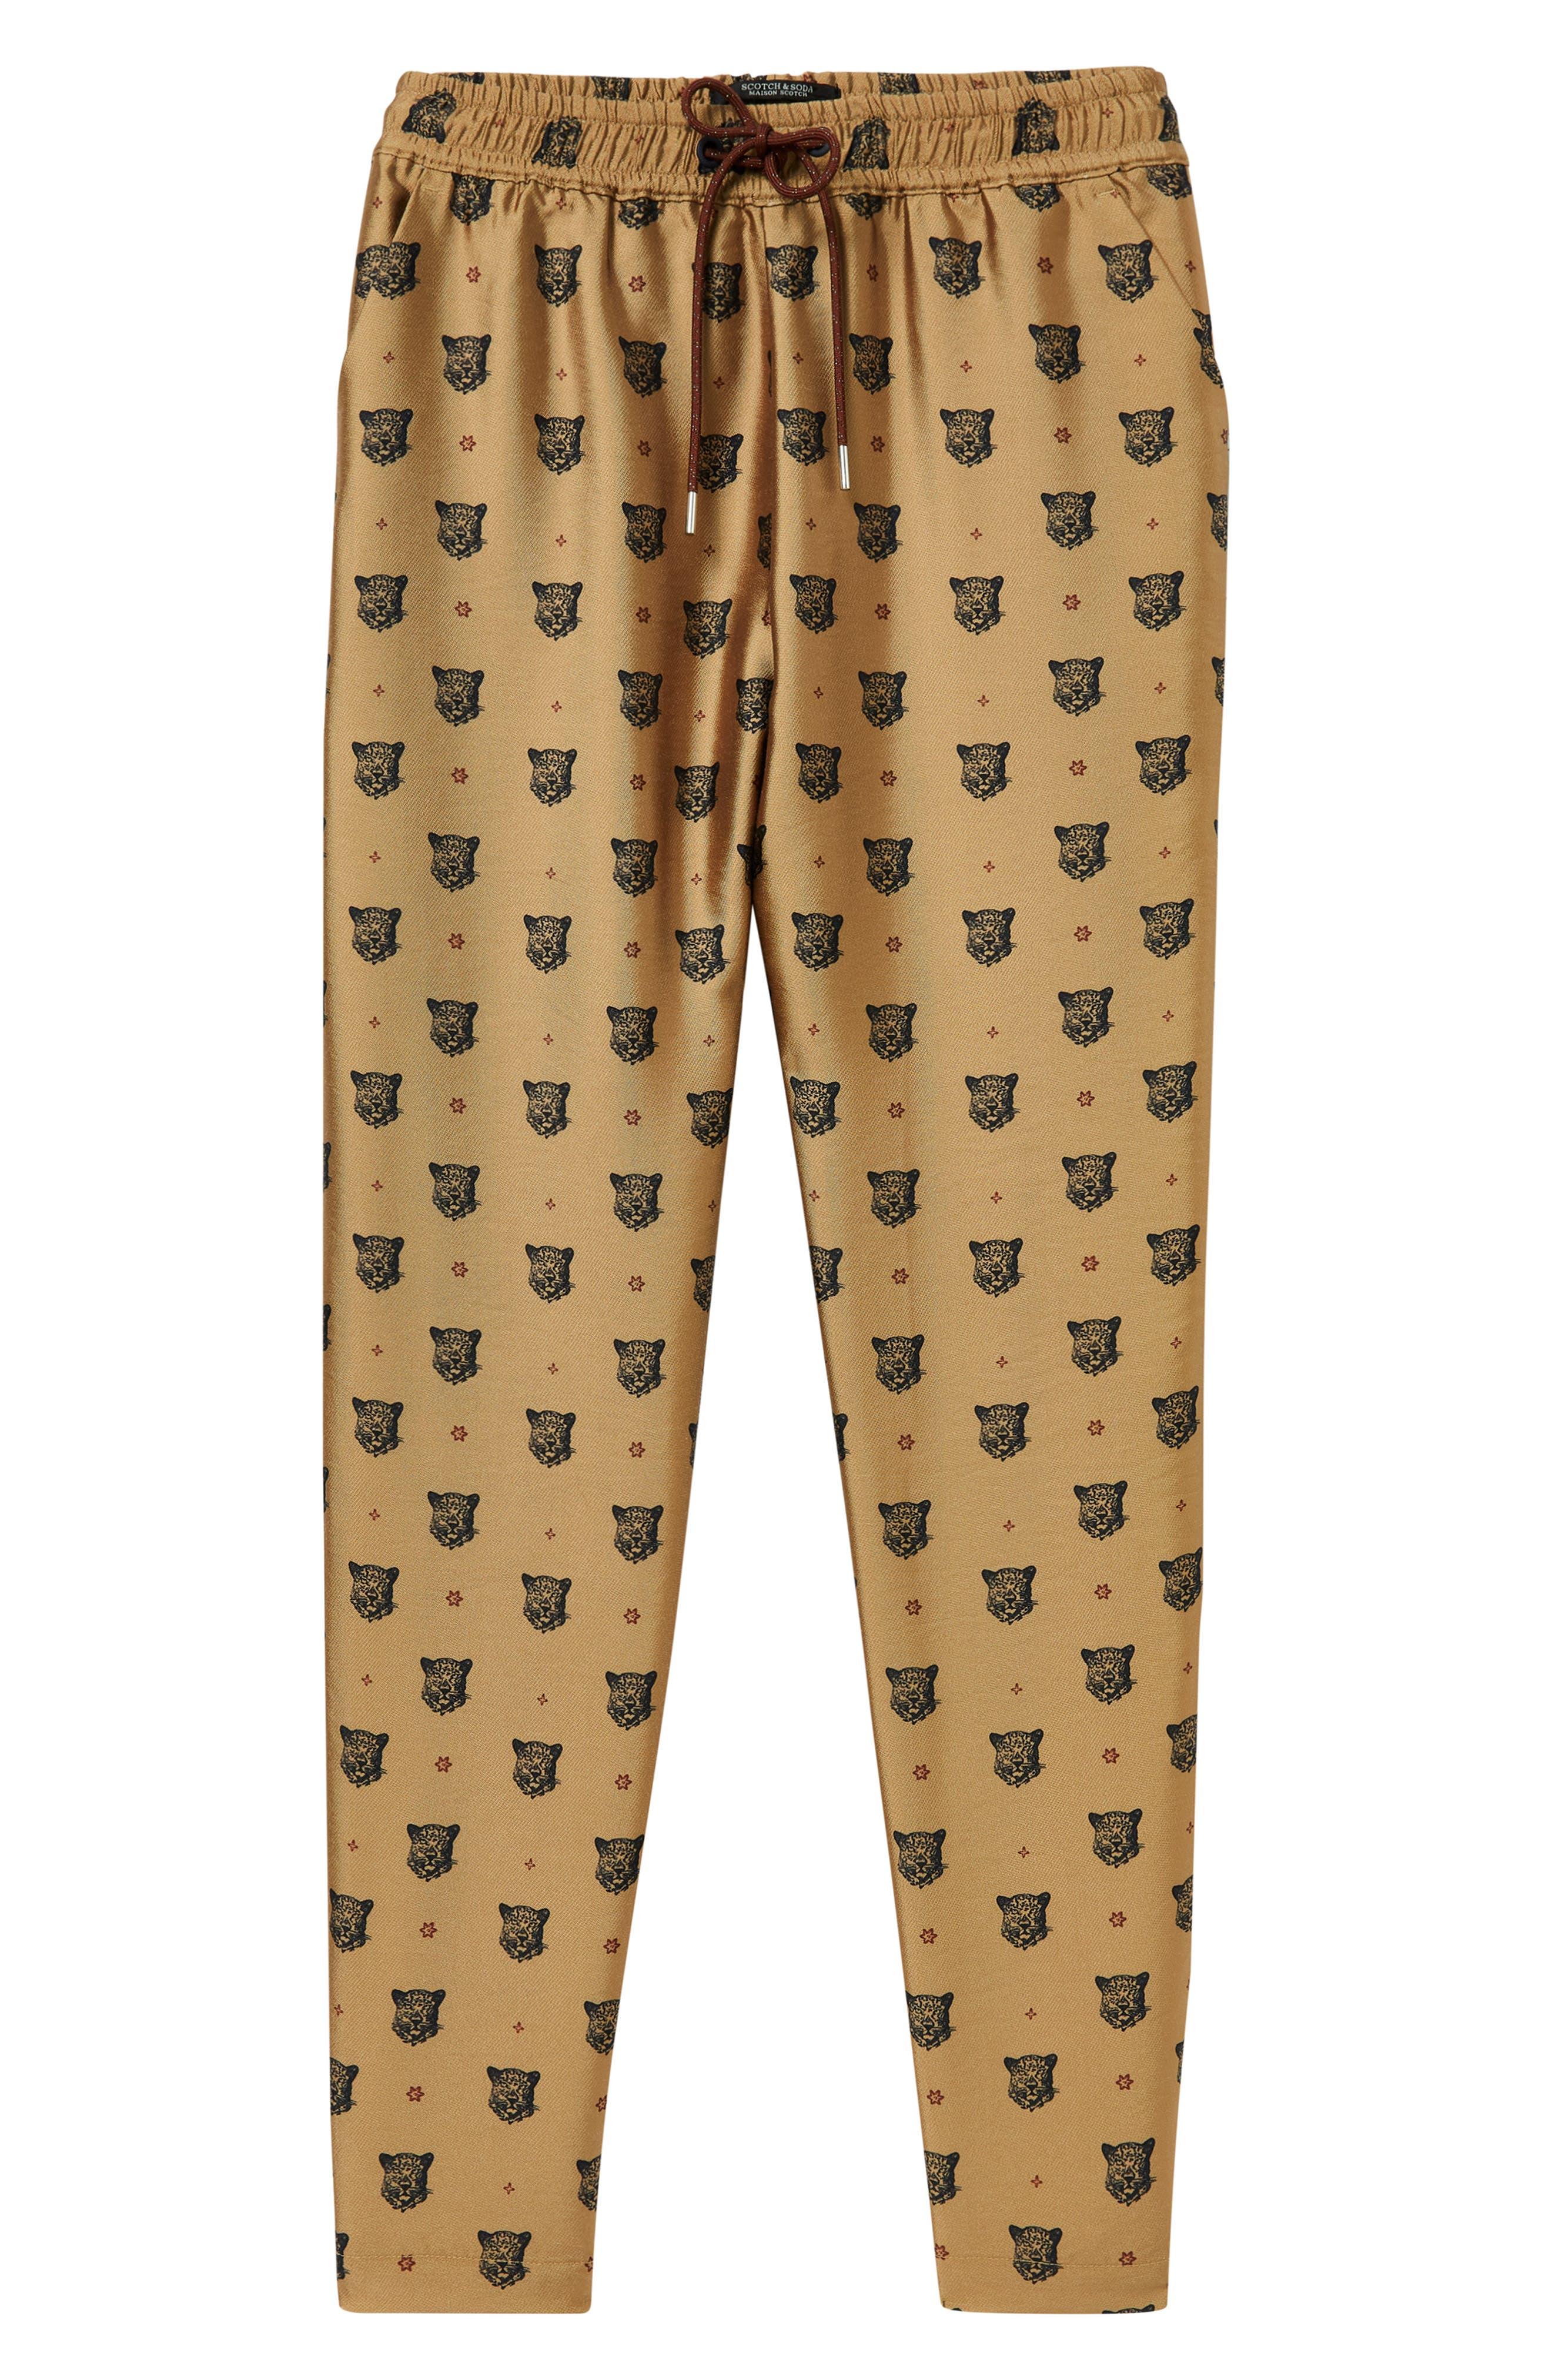 Tailored Leopard Pants,                             Alternate thumbnail 4, color,                             GOLD W/ LEOPARD PRINT